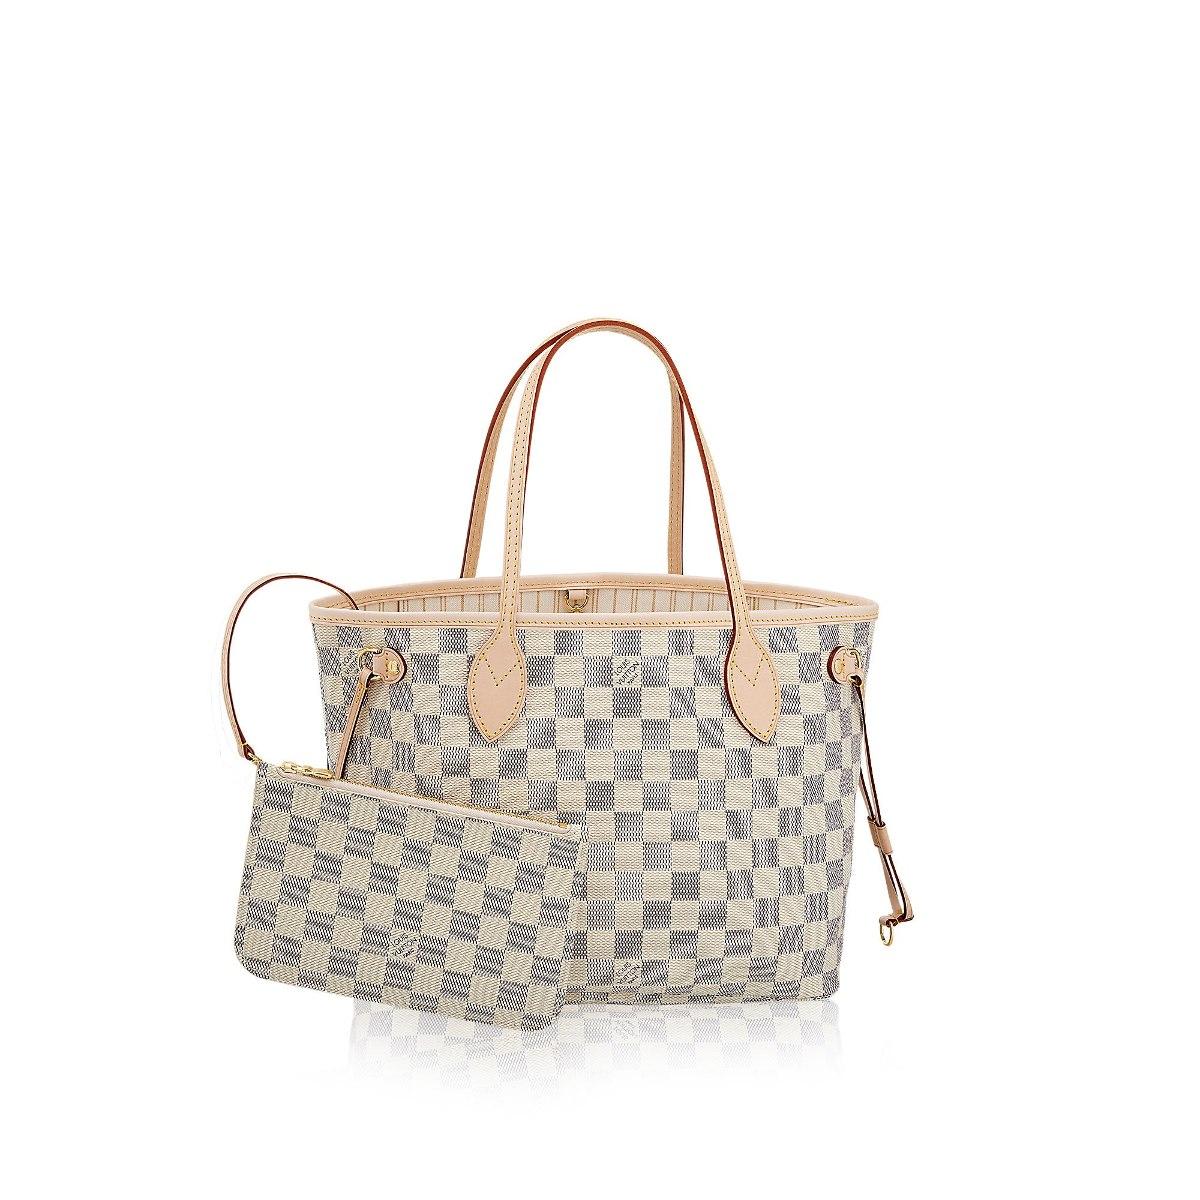 4d0ddb326 Bolsa Louis Vuitton Neverfull Damier Azur Tamanho M - R$ 299,90 em ...